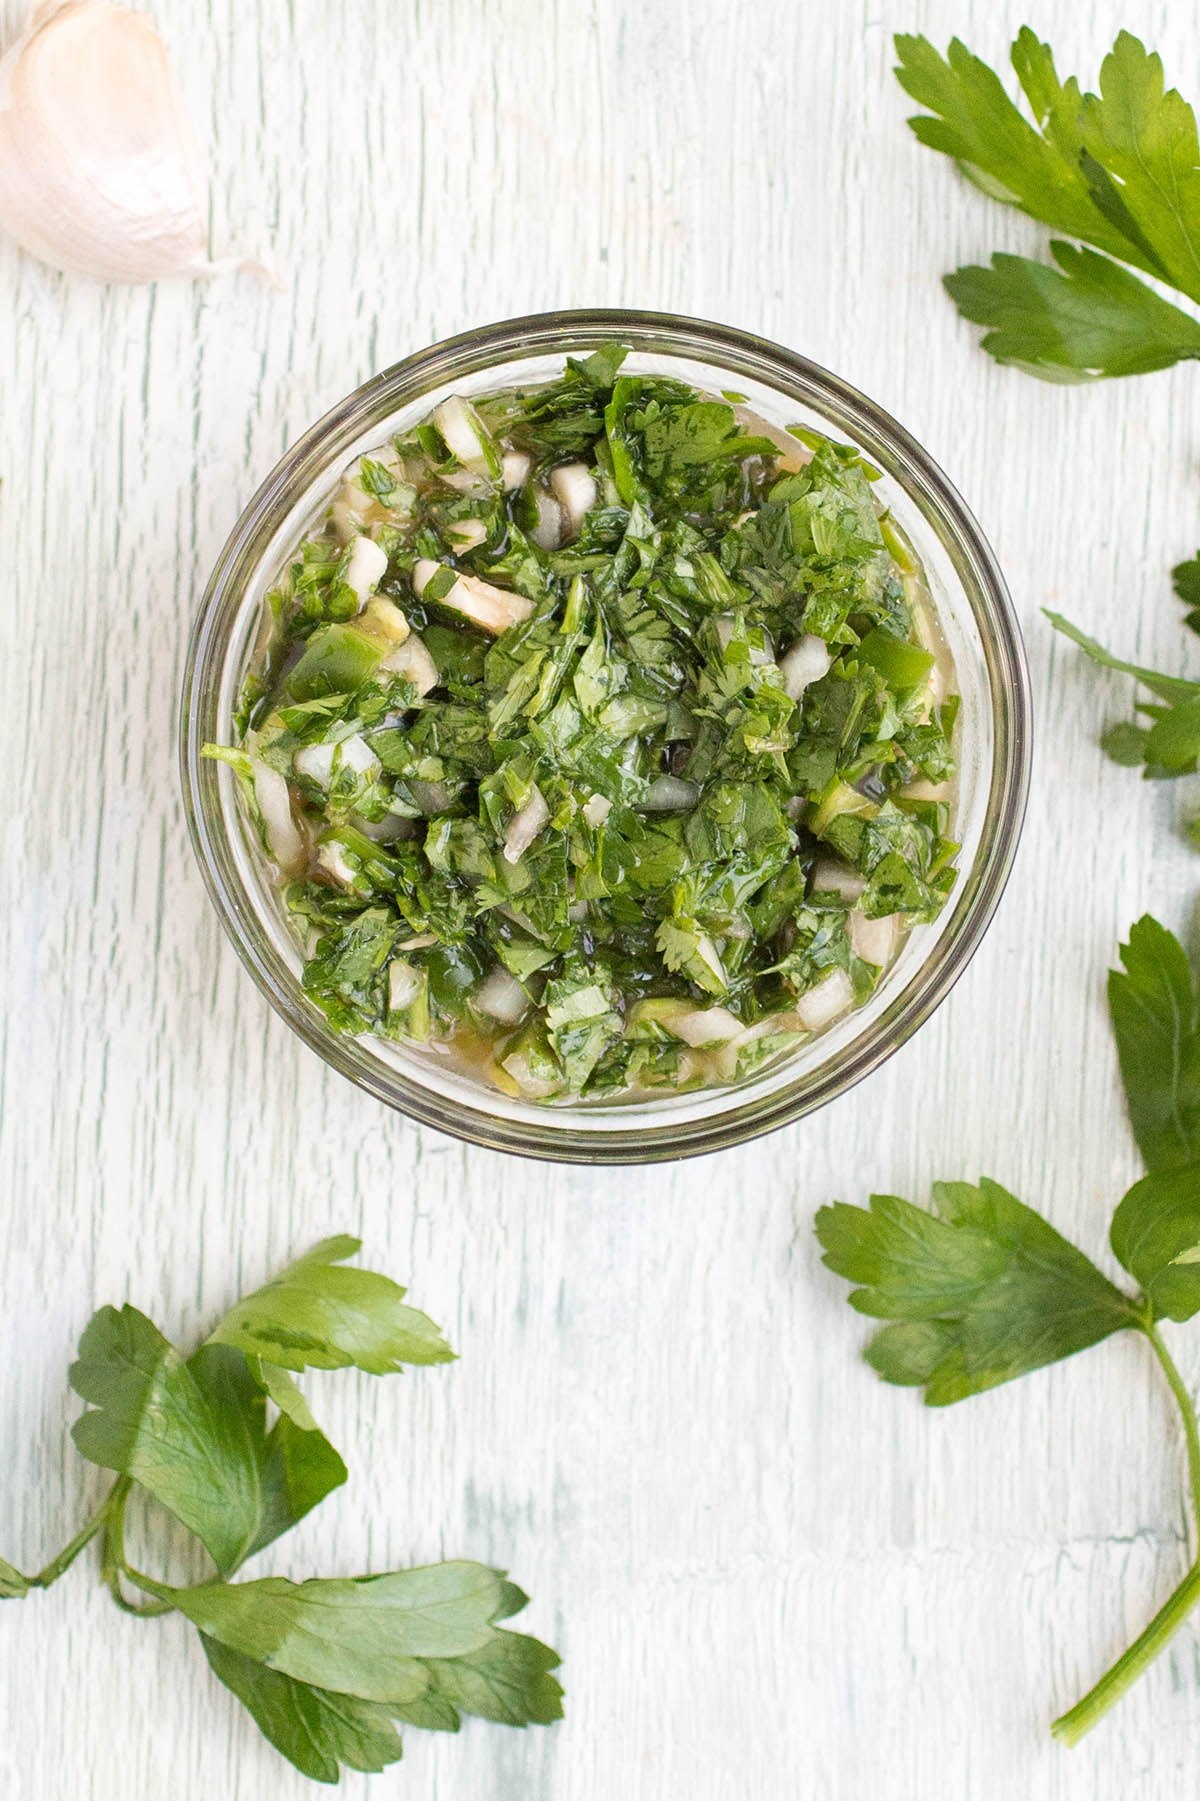 Chimichurri Sauce Recipe (Chimichurri Verde)